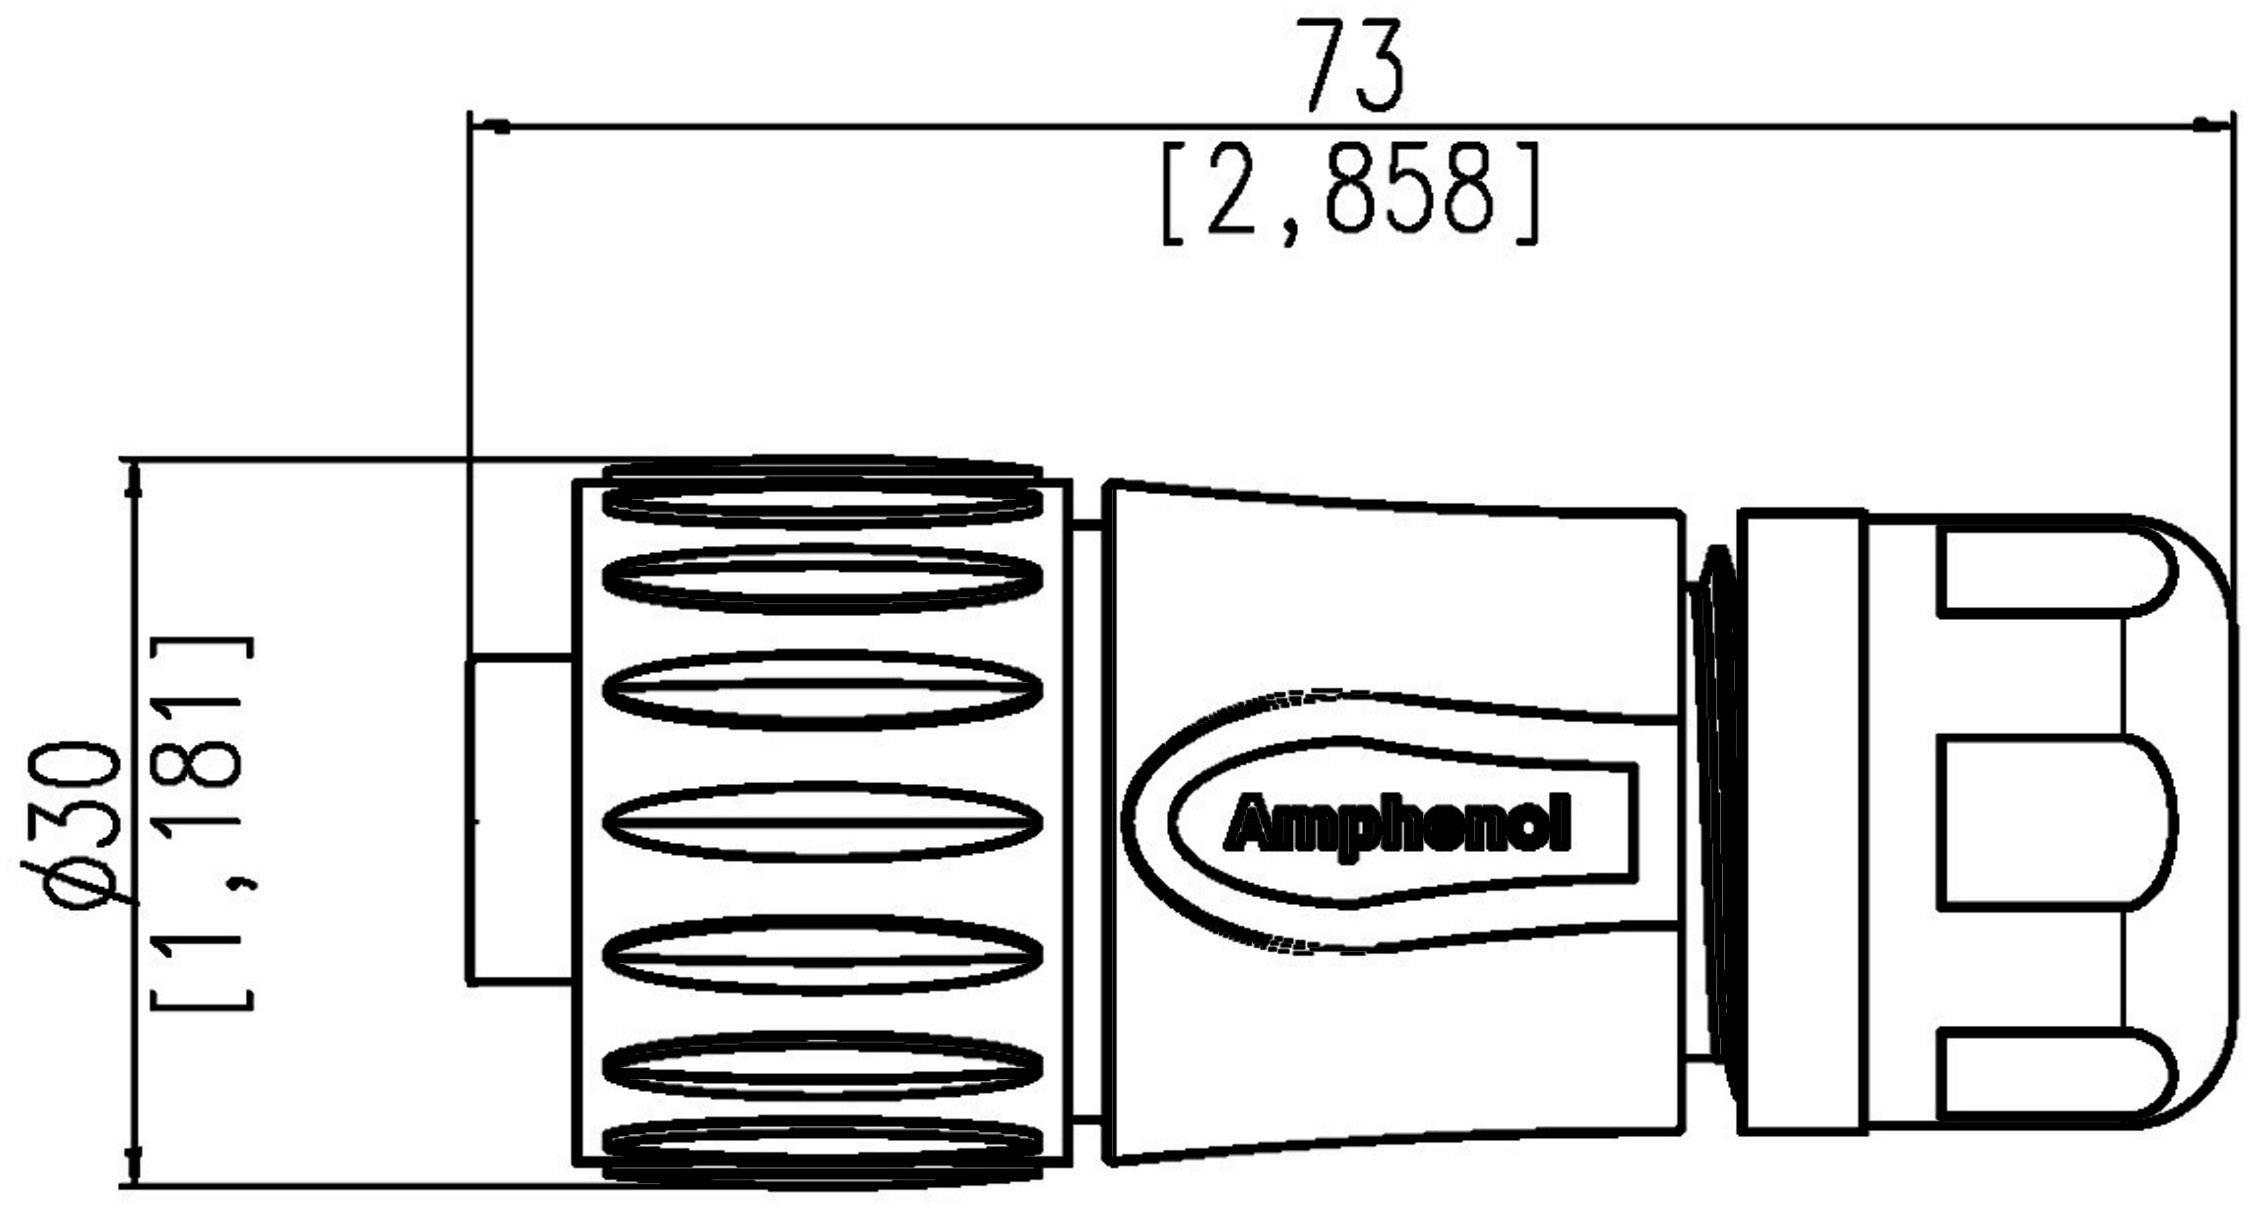 Guľatý faston Amphenol C016 30D006 110 12 IP67 (v zablokovanom stave), polyamid 6.6, pólů 6 + PE, 1 ks